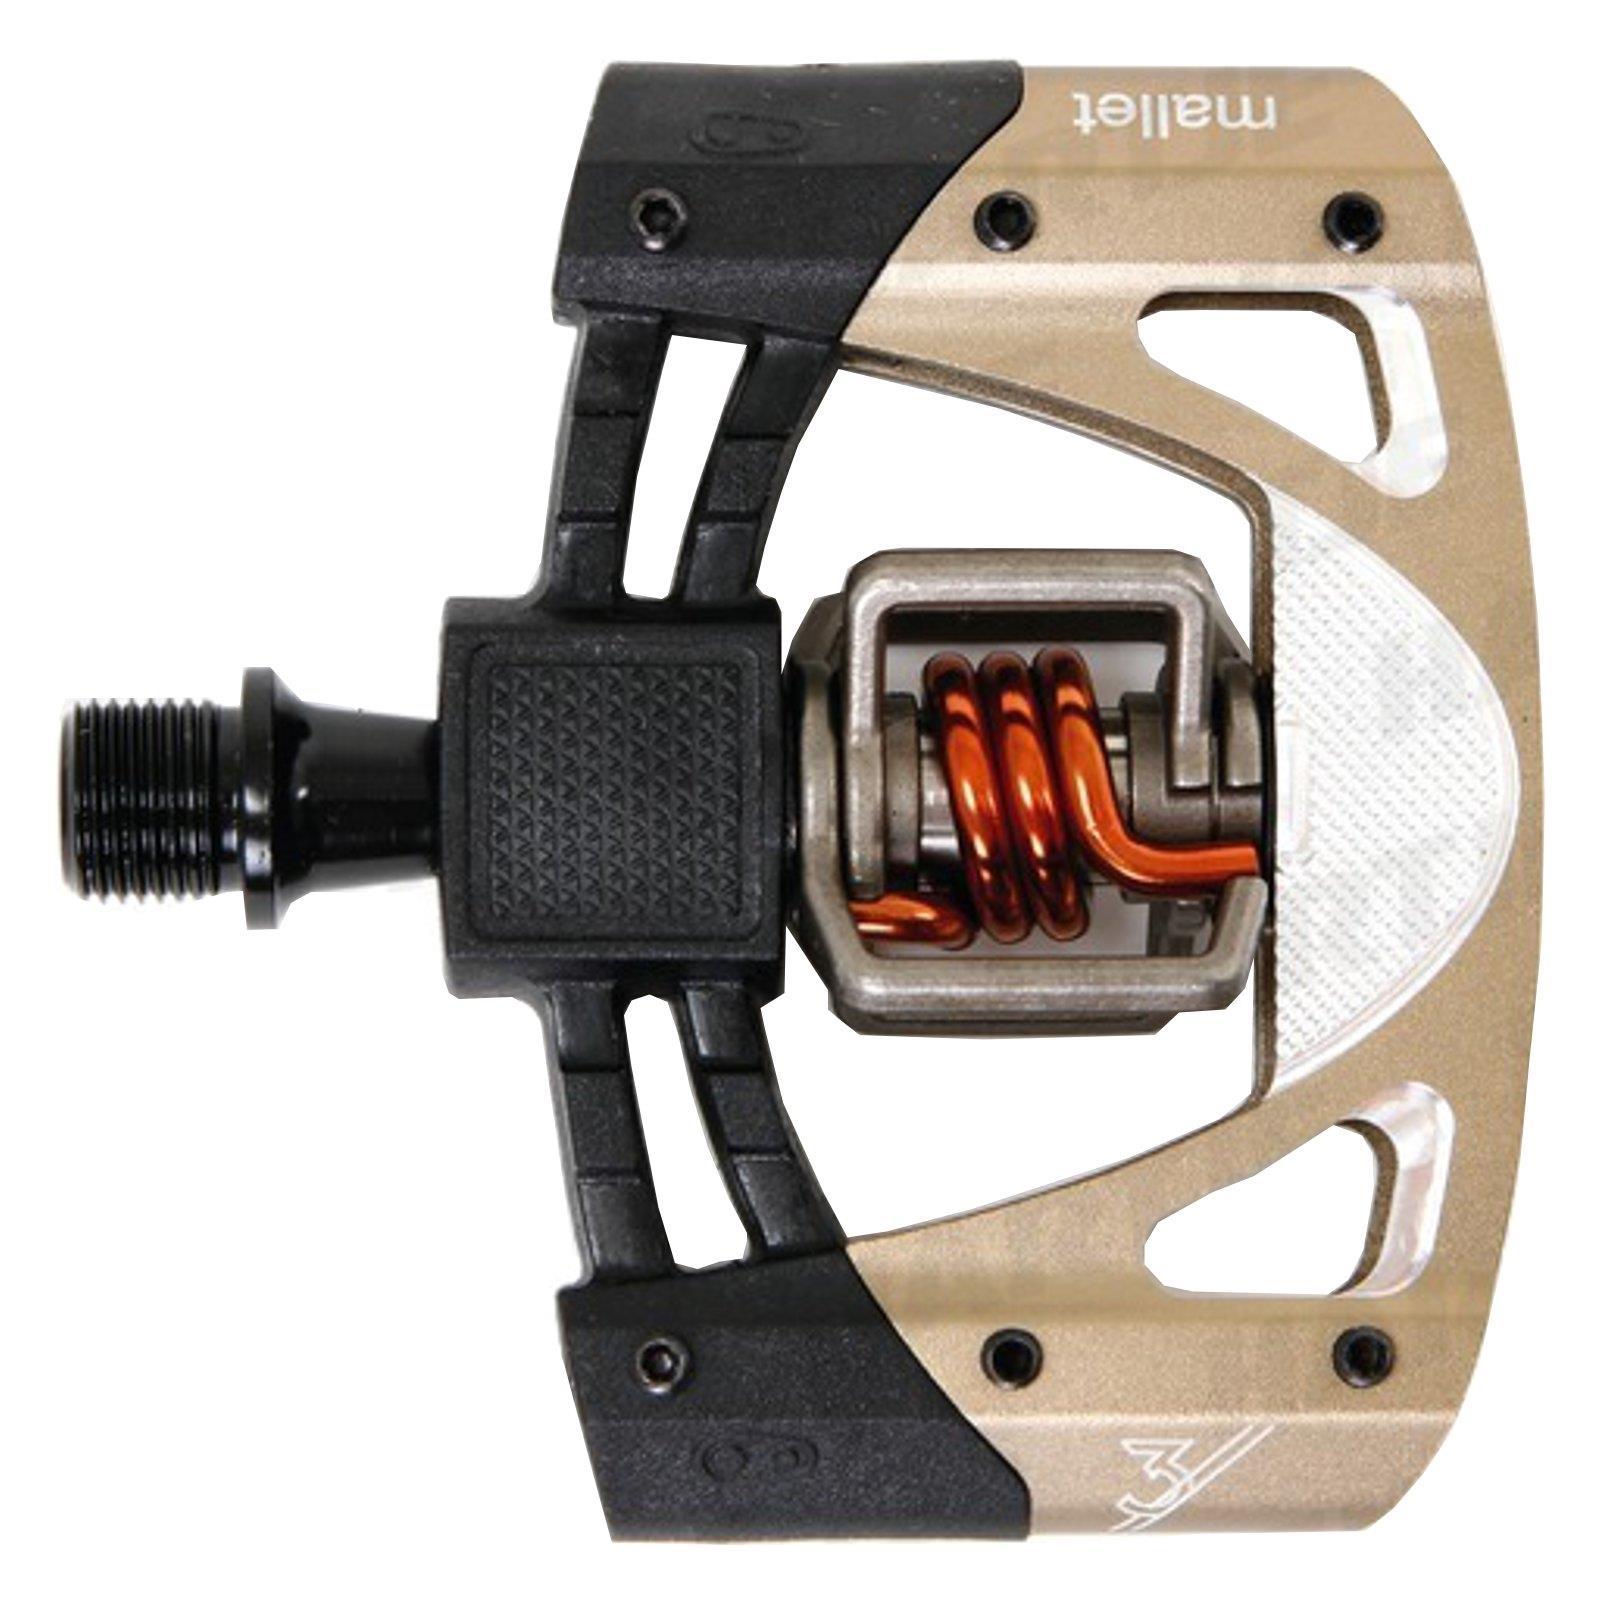 Crankbrothers DOWNHILL DOWNHILL DOWNHILL sistema PEDALI MALLET 3 CICLISMO FLAT Pedali Bicicletta Pedali 642d4a